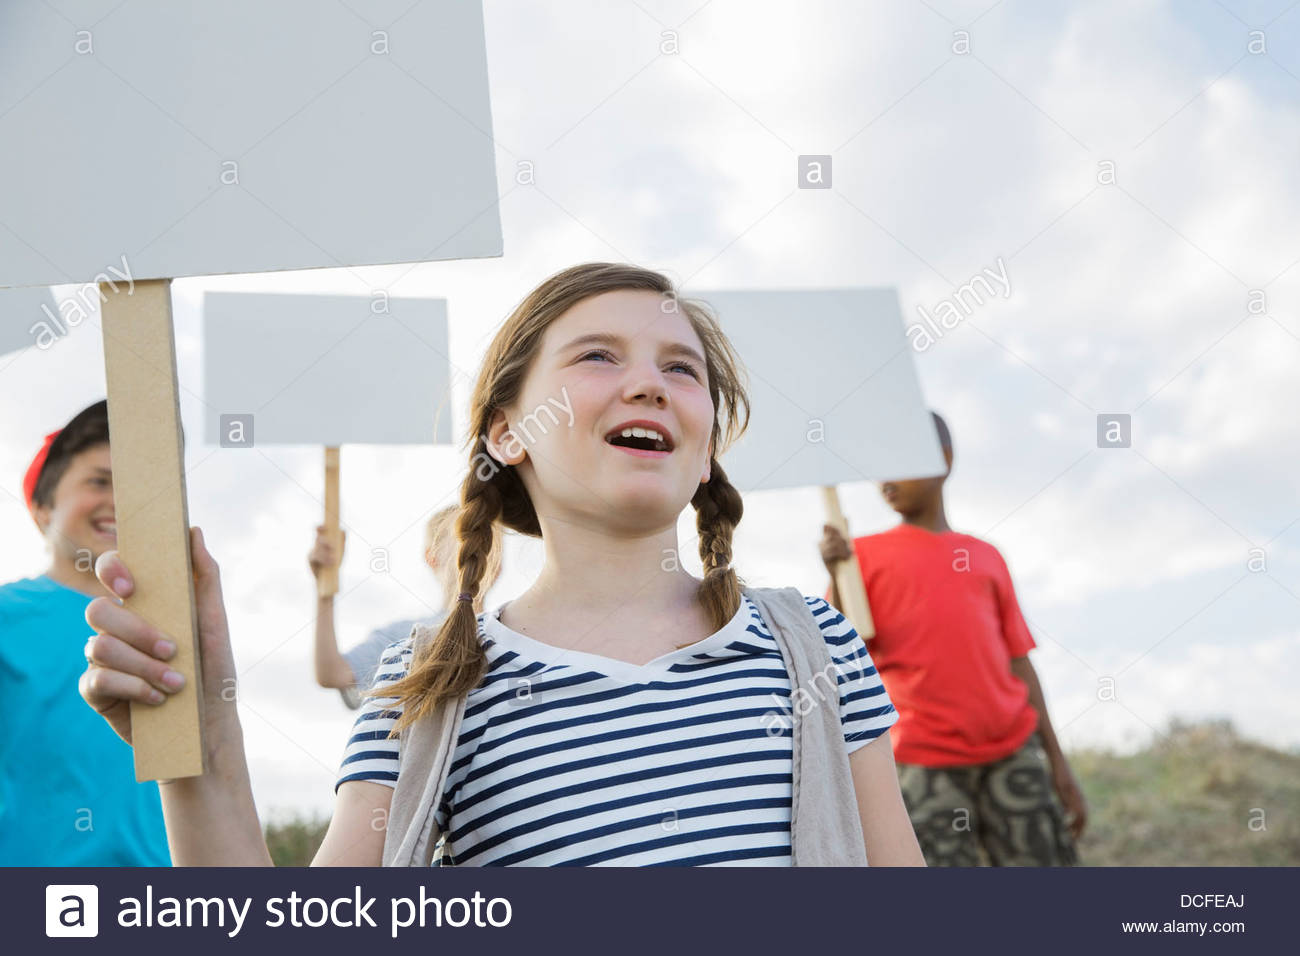 Cute girl holding blank billboard outdoors - Stock Image